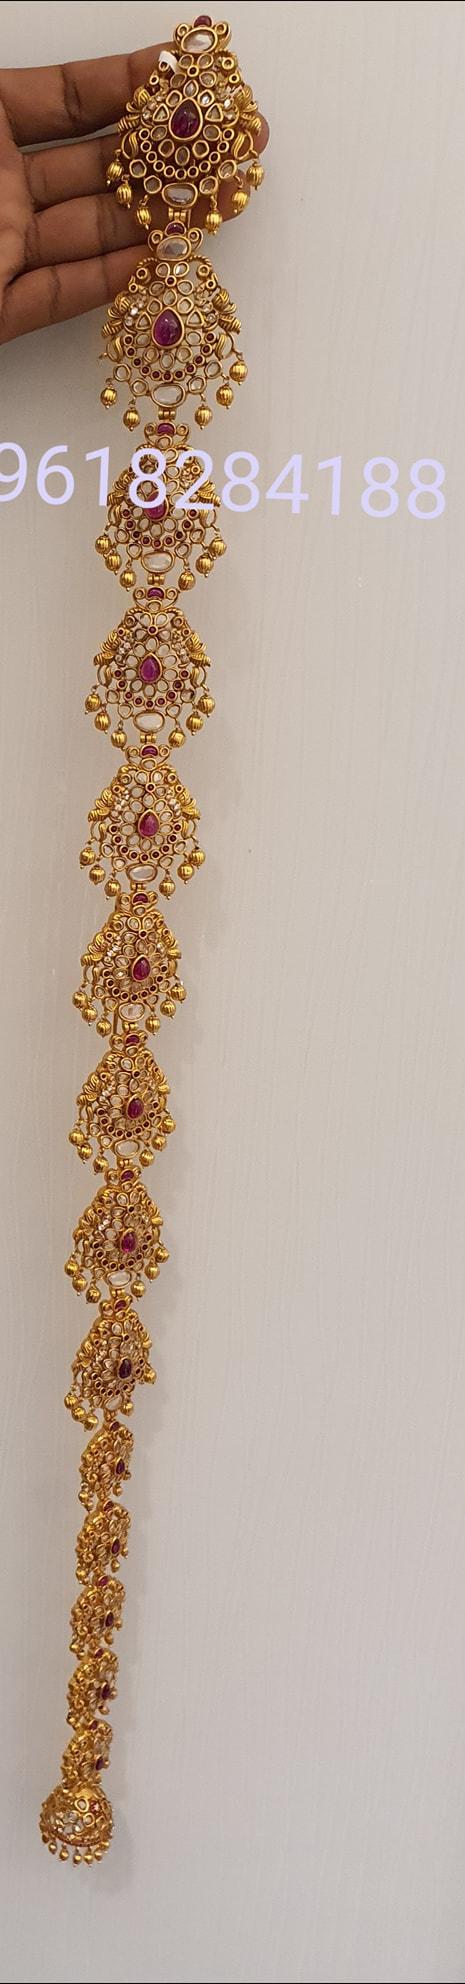 Beautiful one gram gold jada.